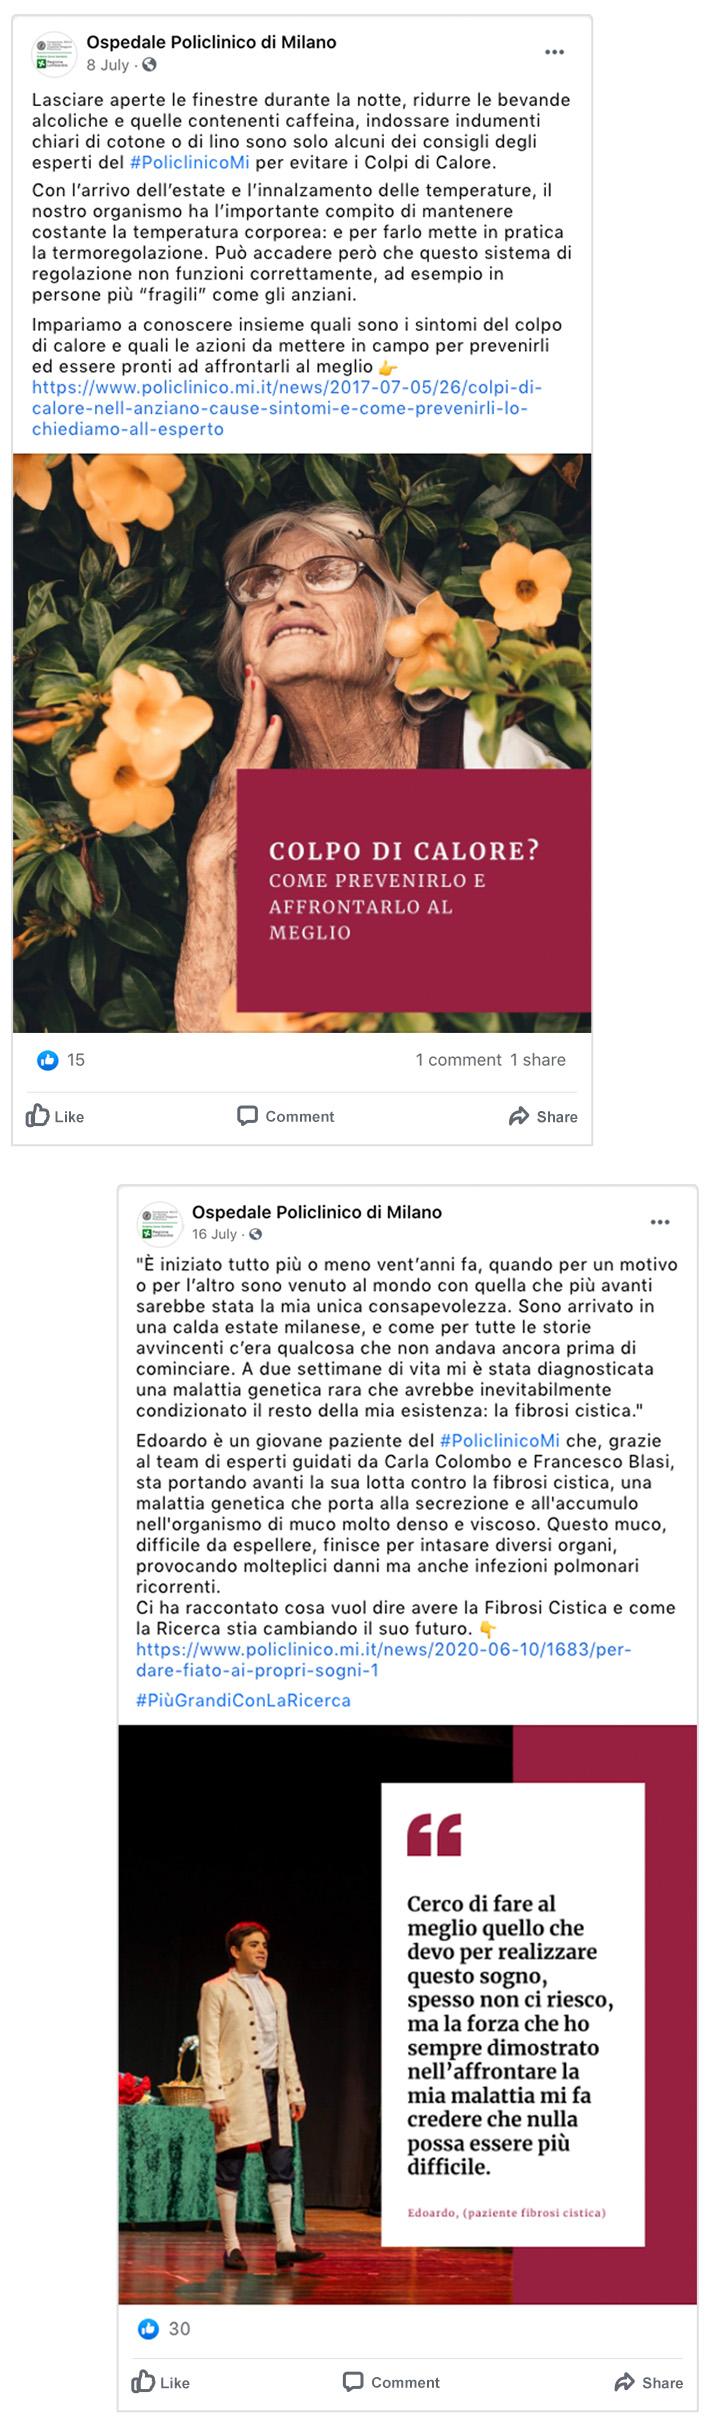 image of social media post of policlinico